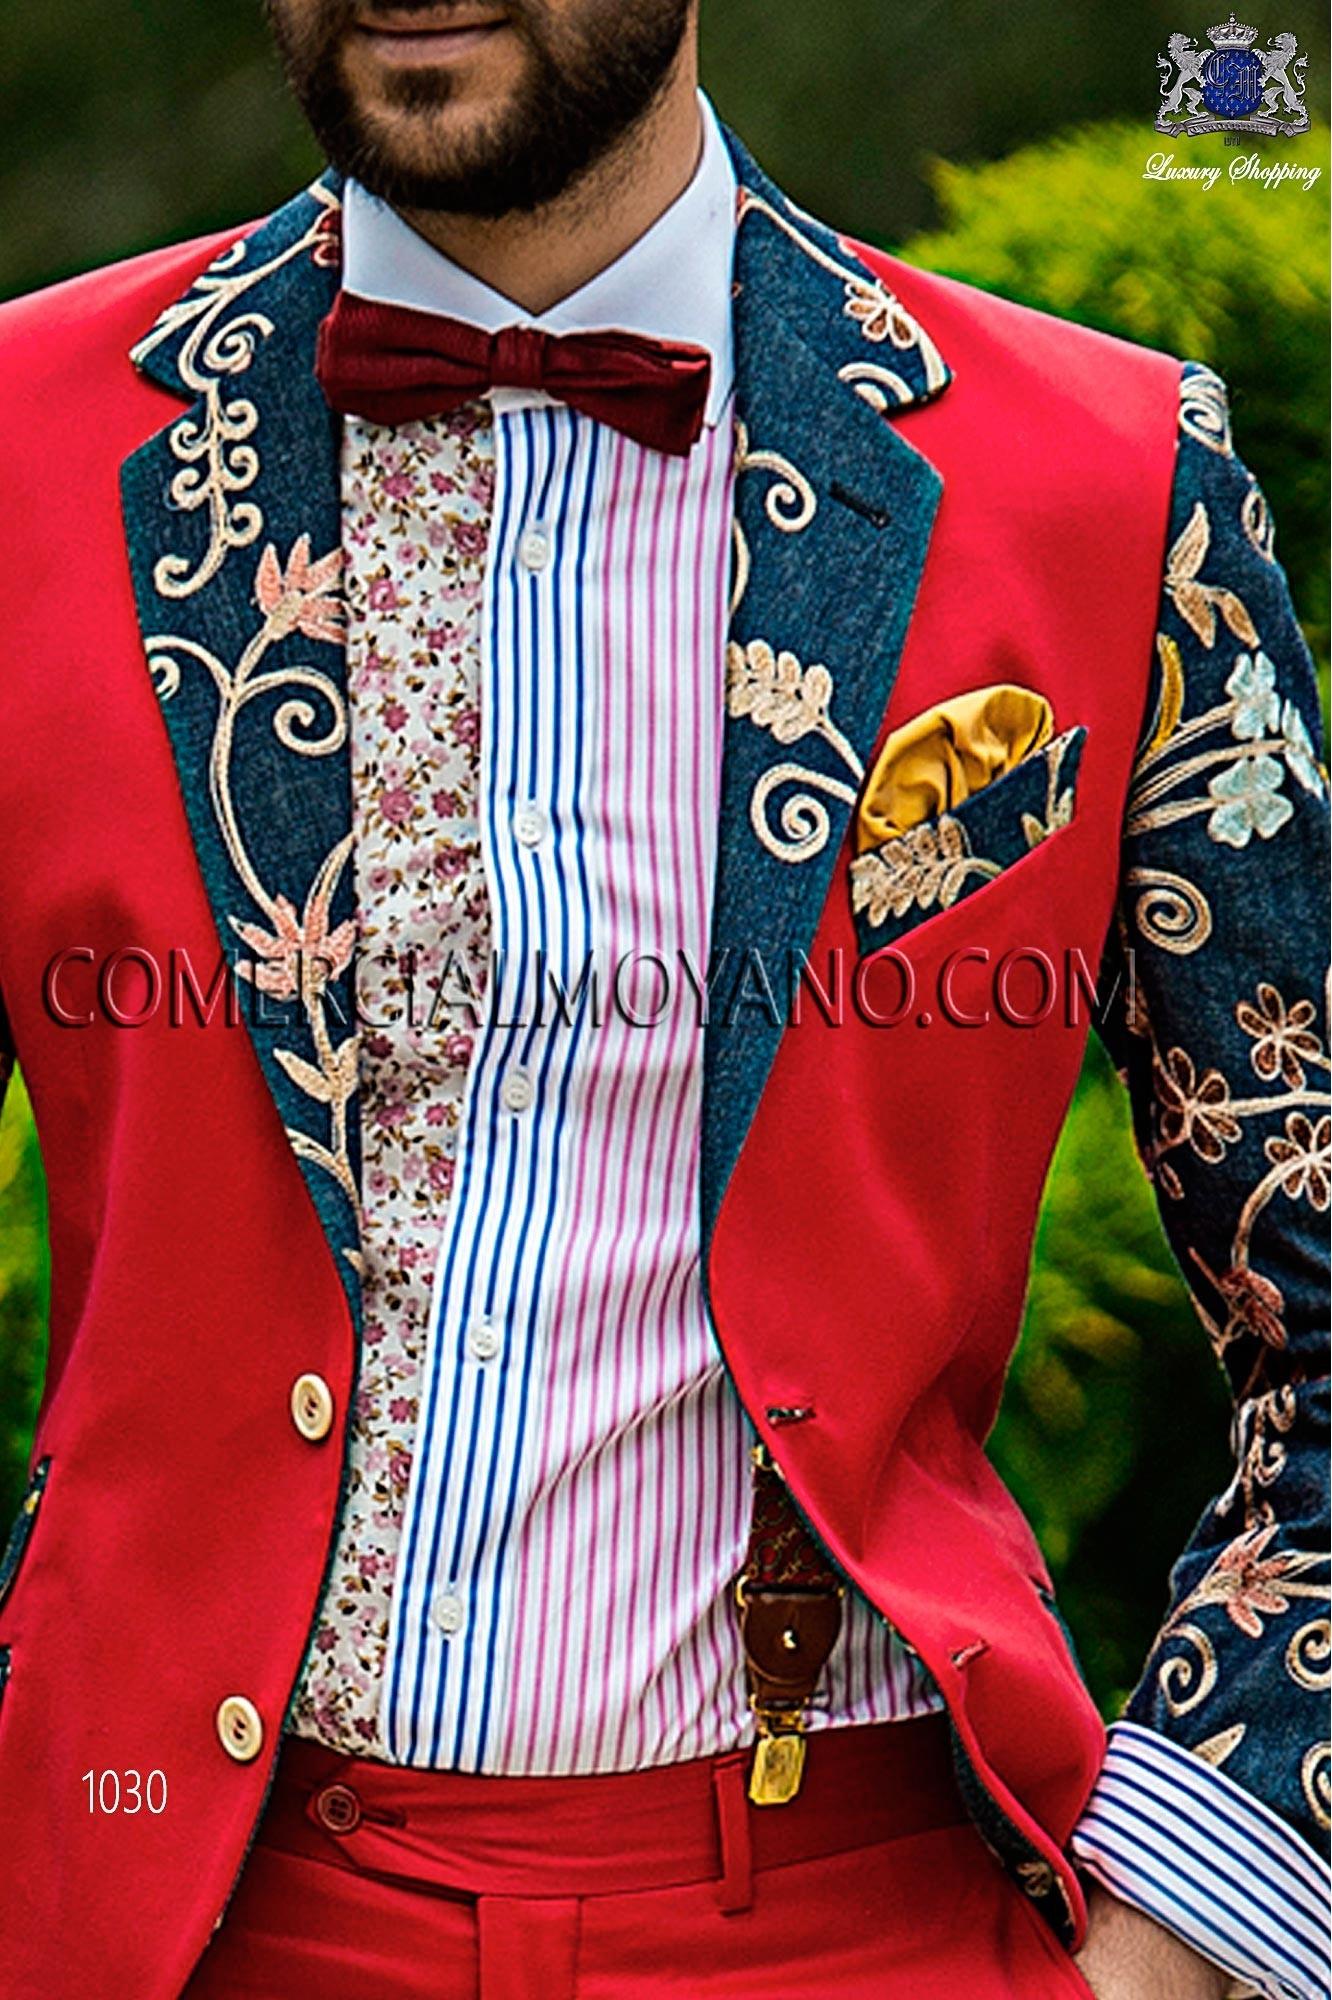 Italian hipster red/blue men wedding suit, model: 1030 Ottavio Nuccio Gala Hipster Collection